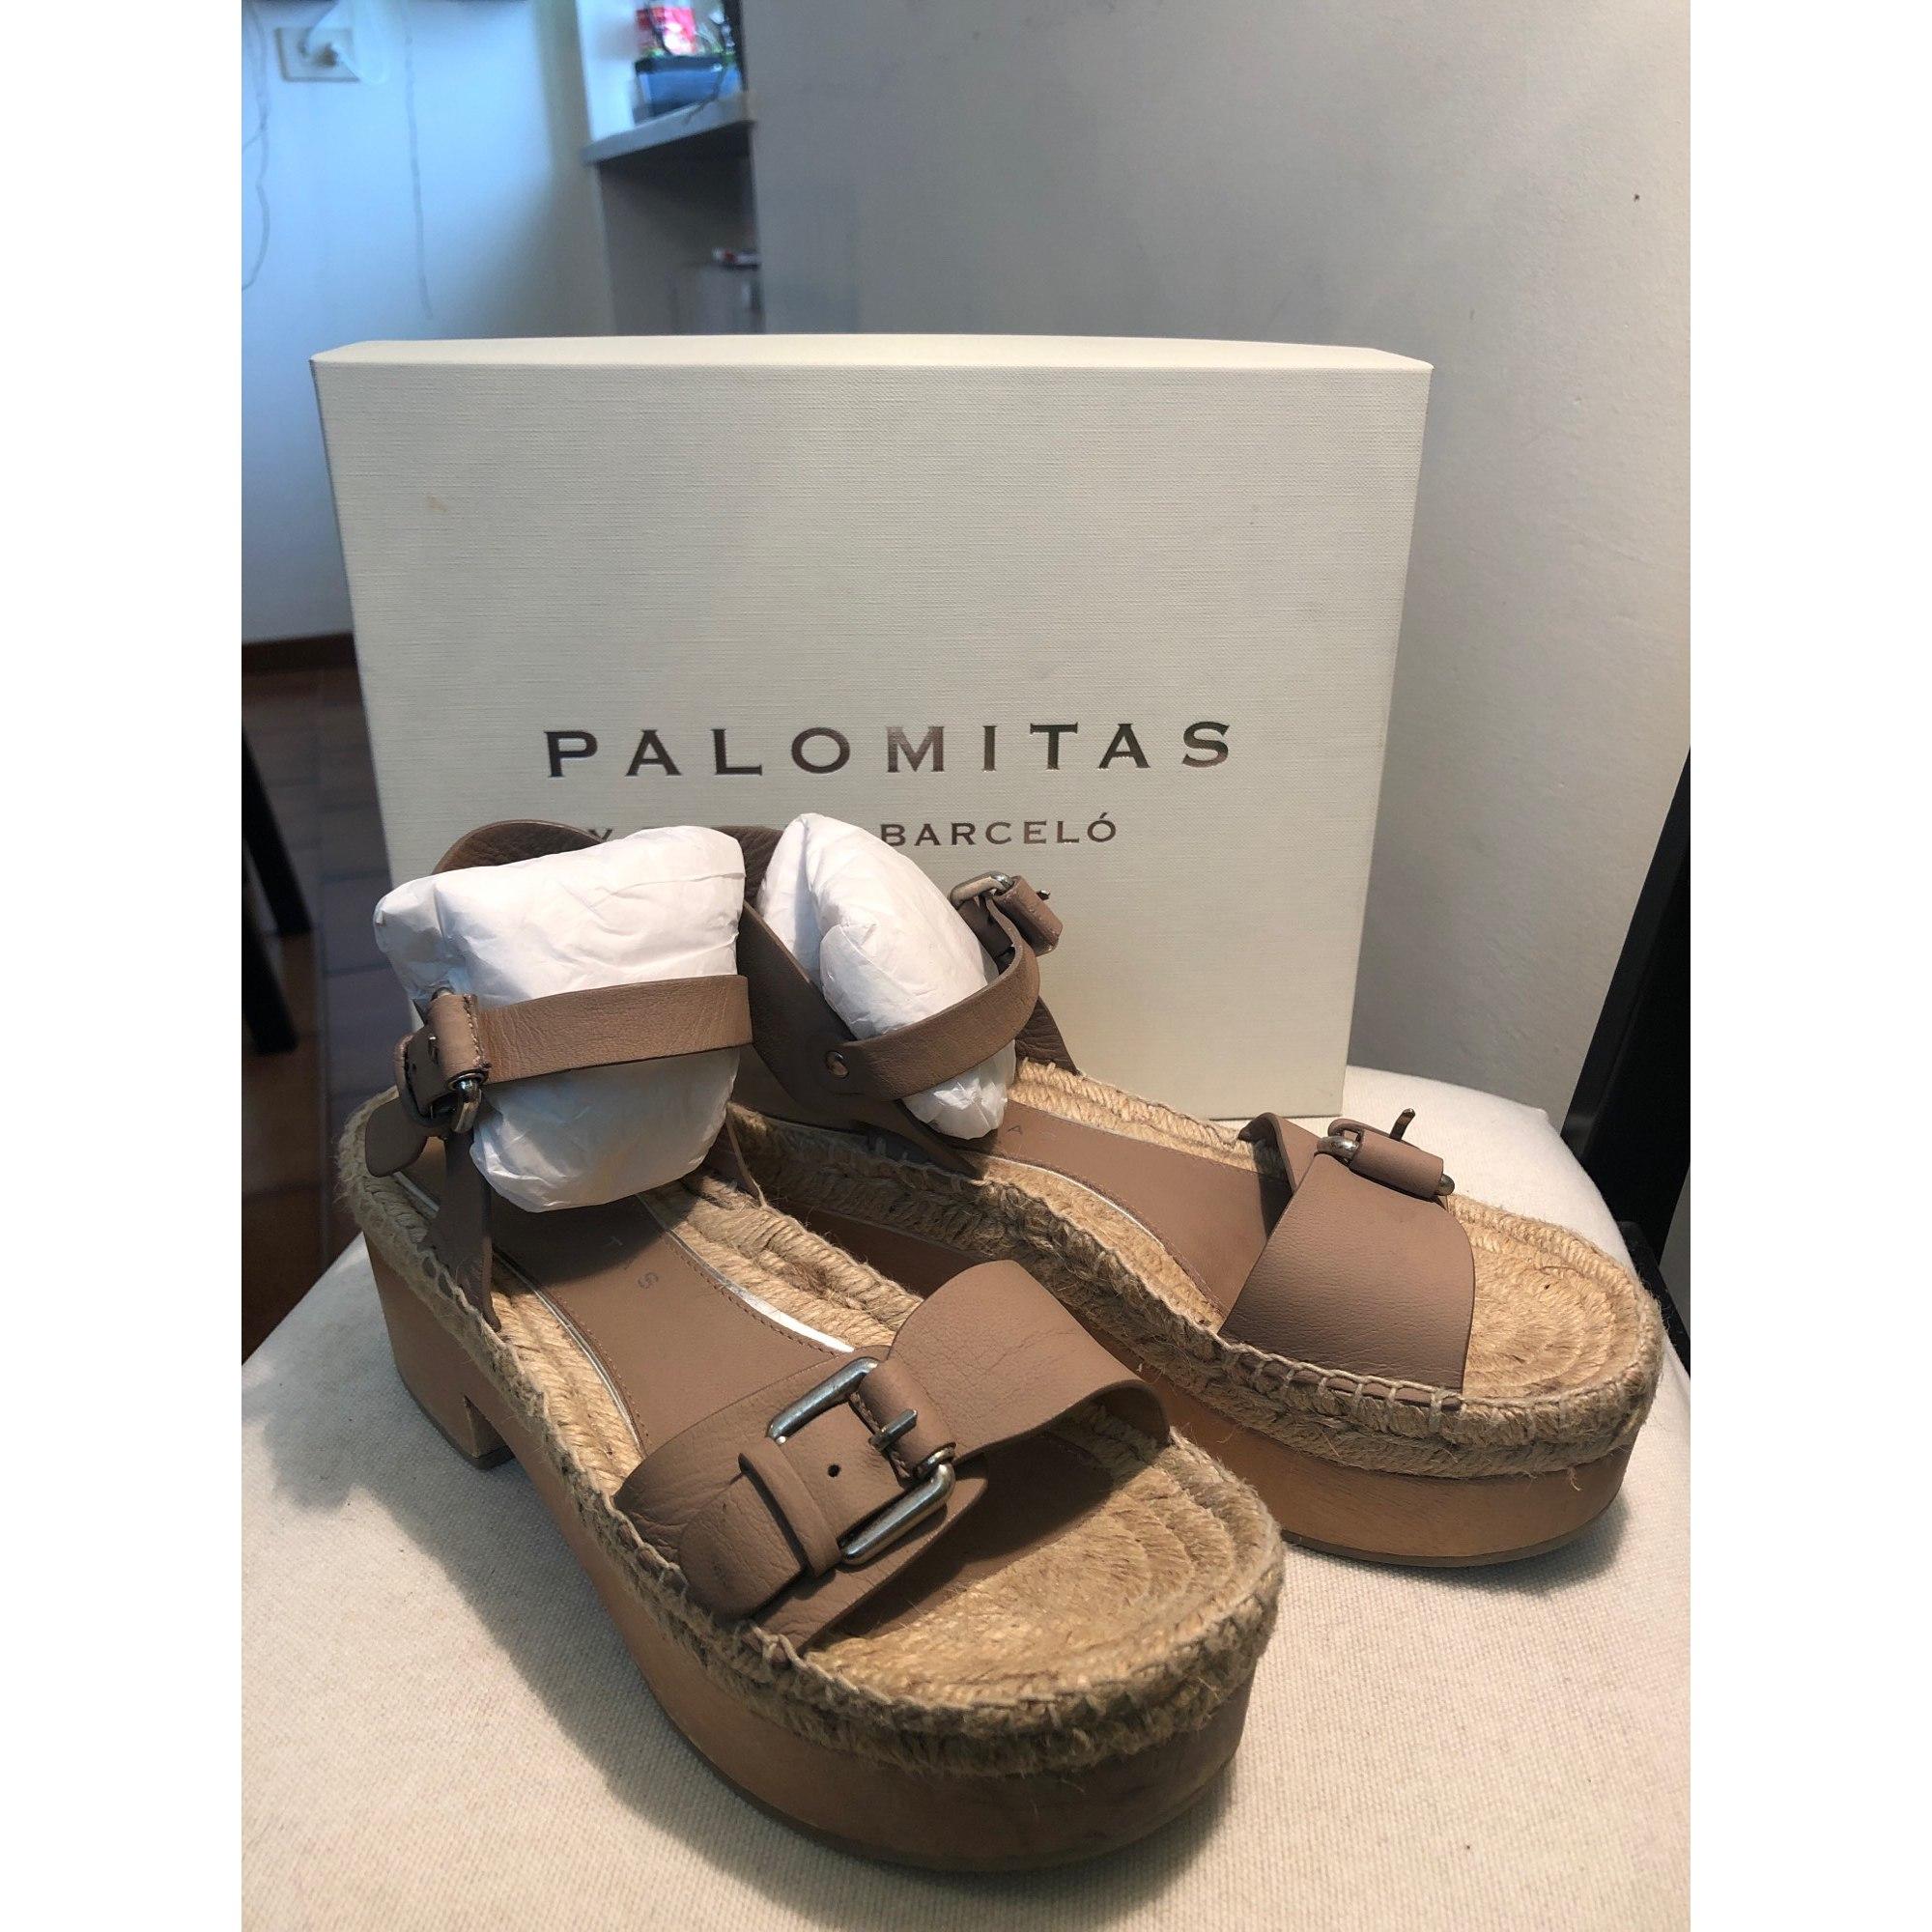 Sandales compensées PALOMA BARCELO Beige, camel